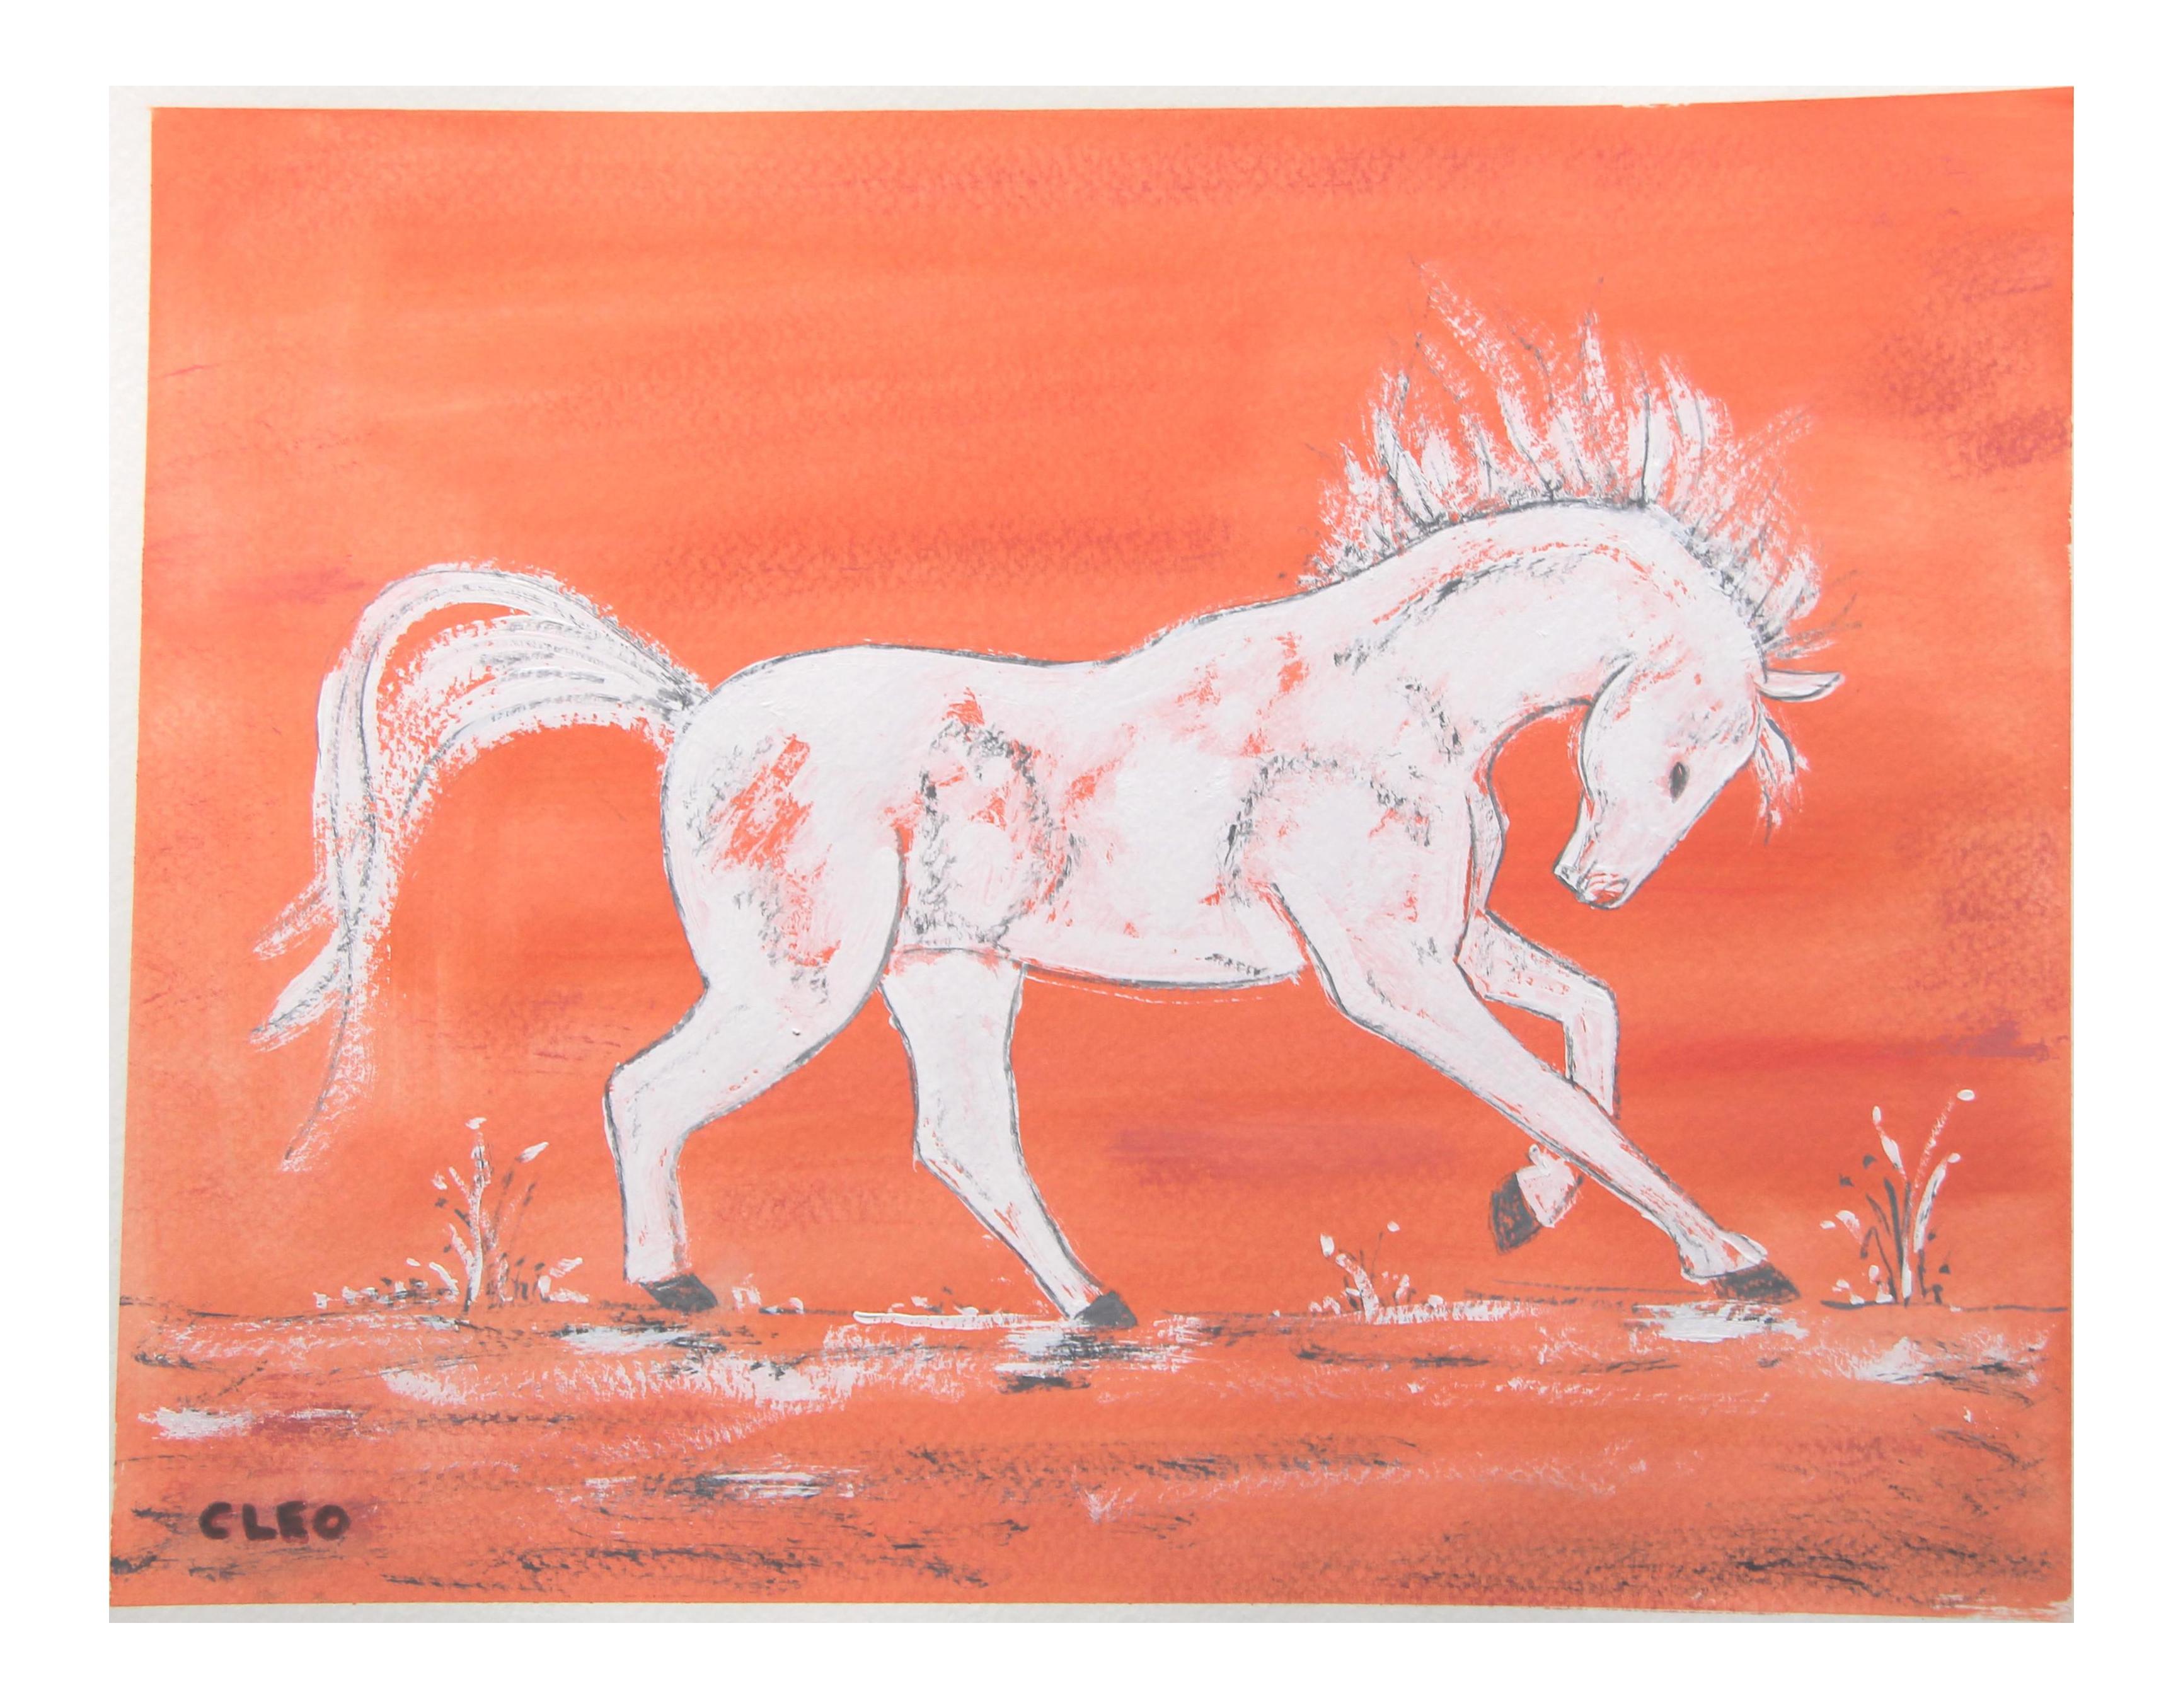 Chinoiserie White Horse Painting By Cleo Plowden Chairish